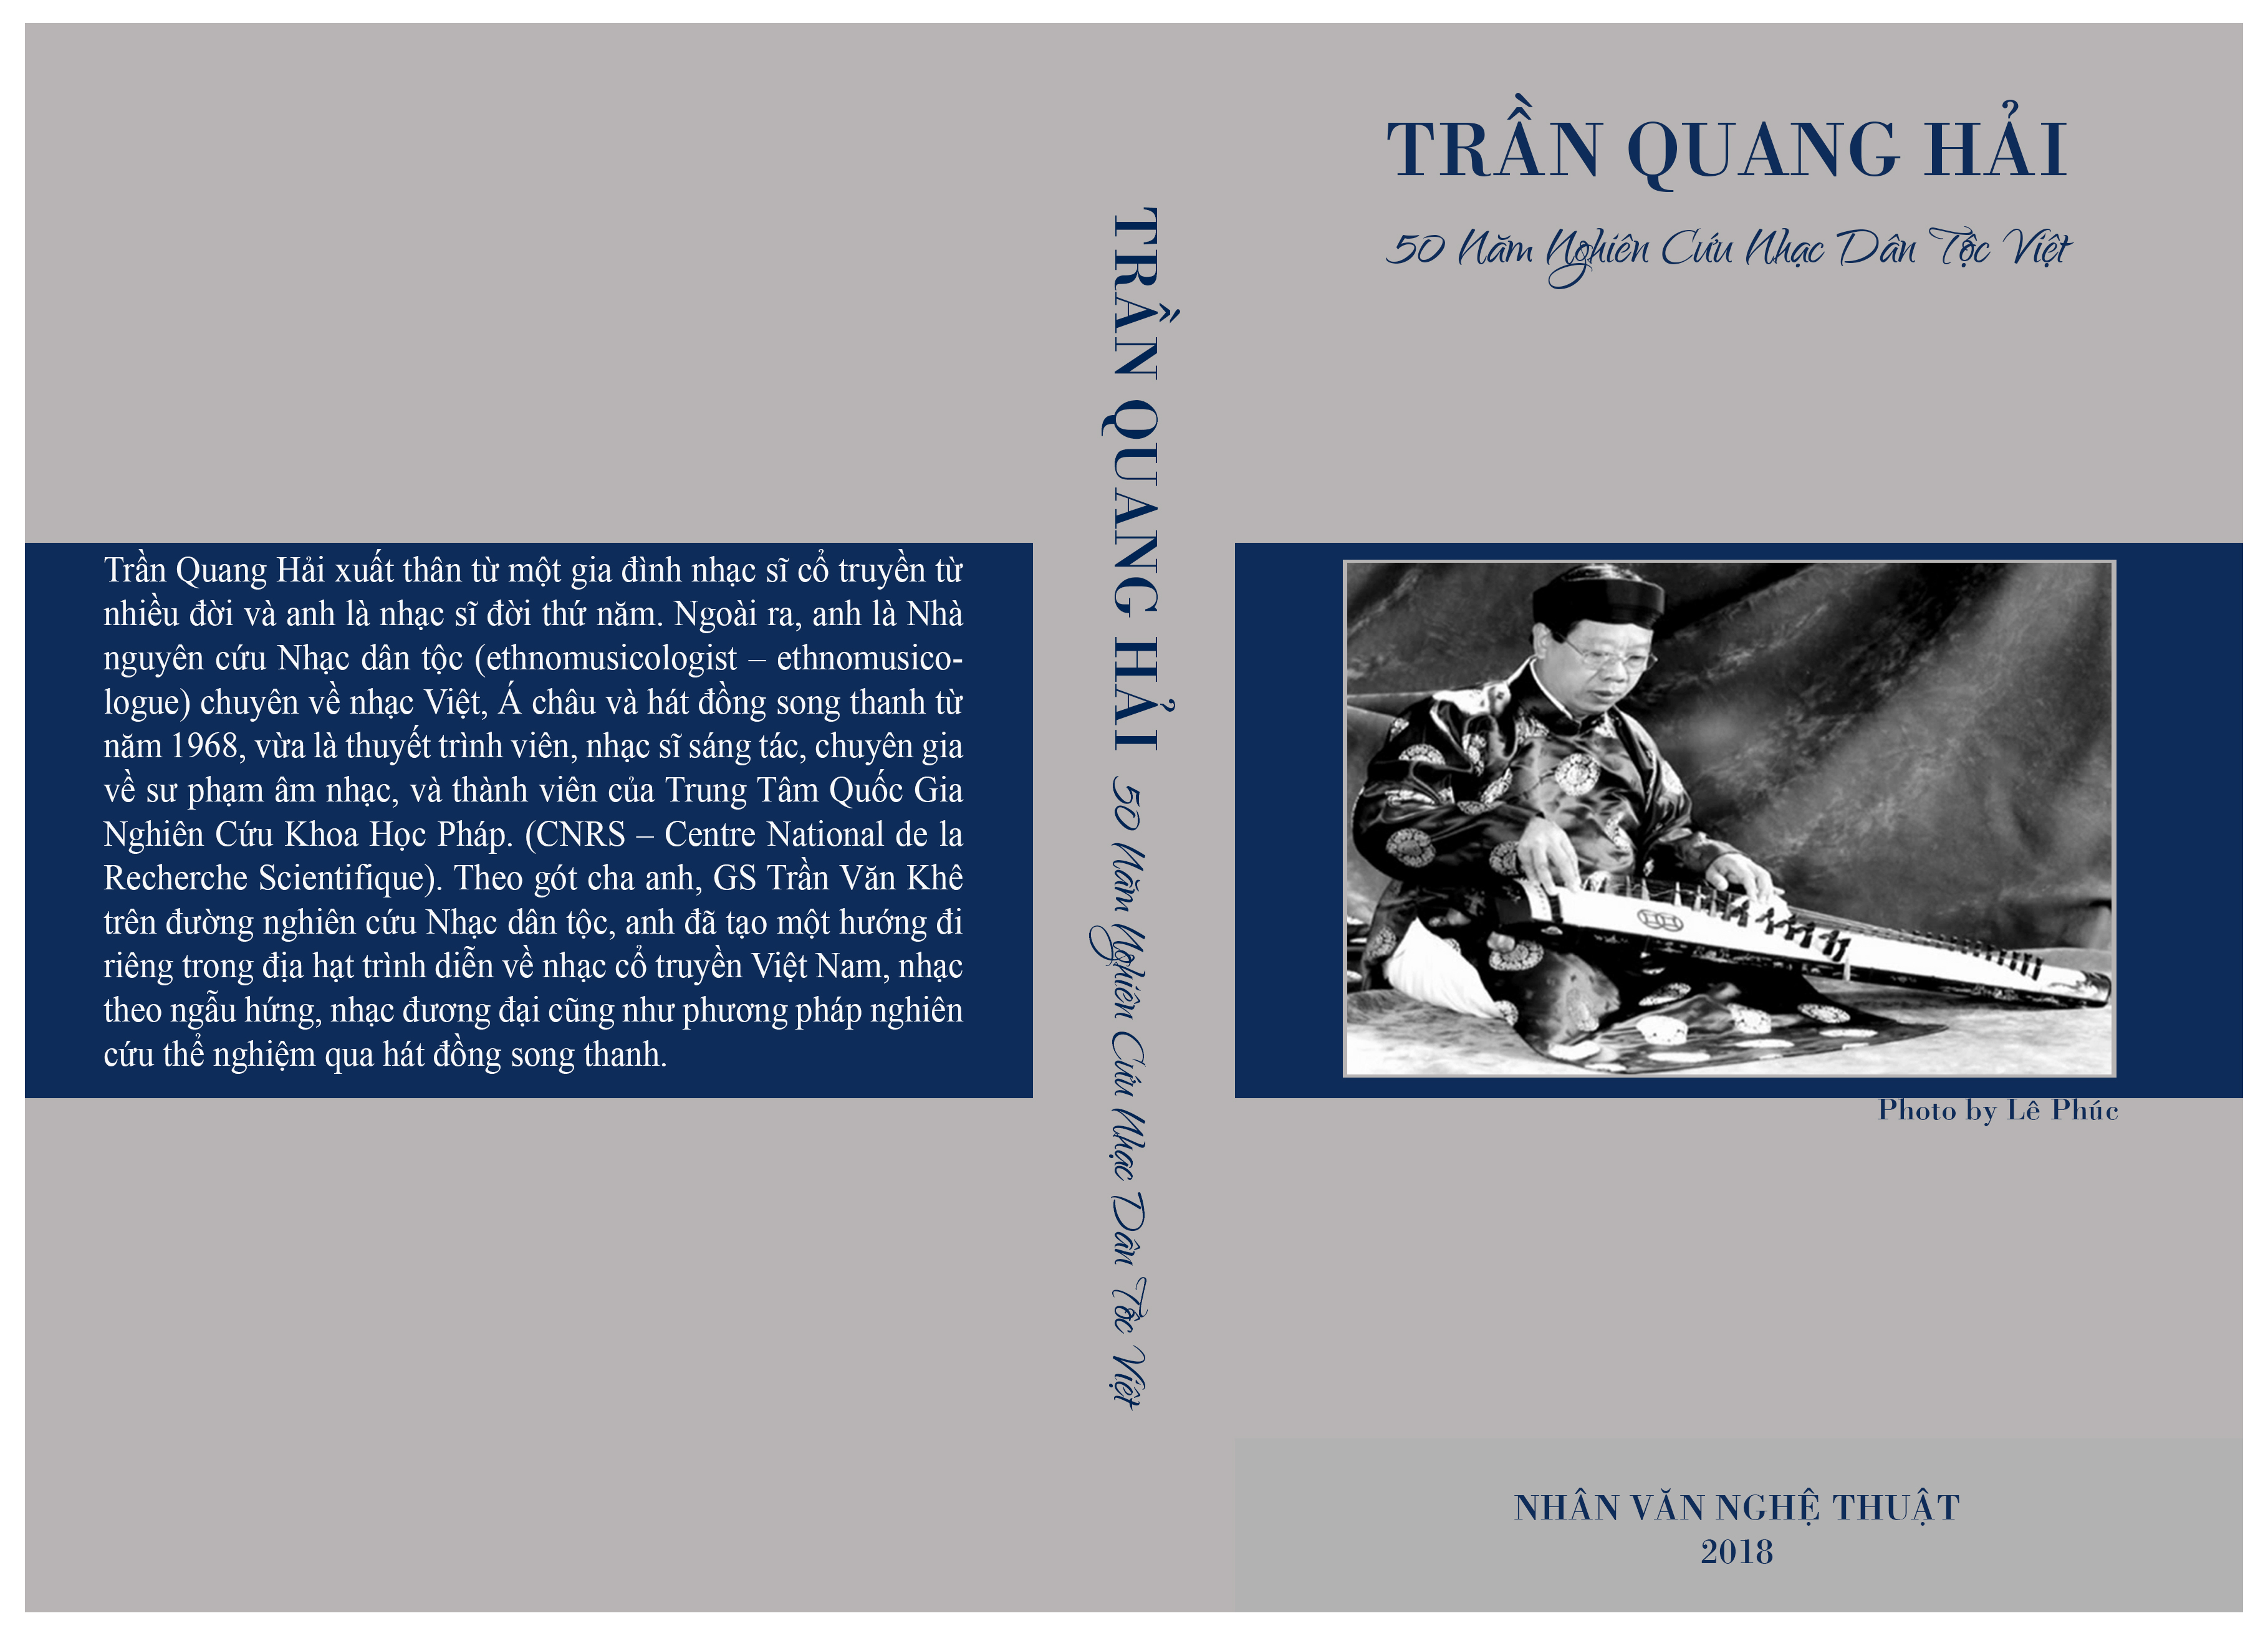 Book Cover 10-7-18.jpg